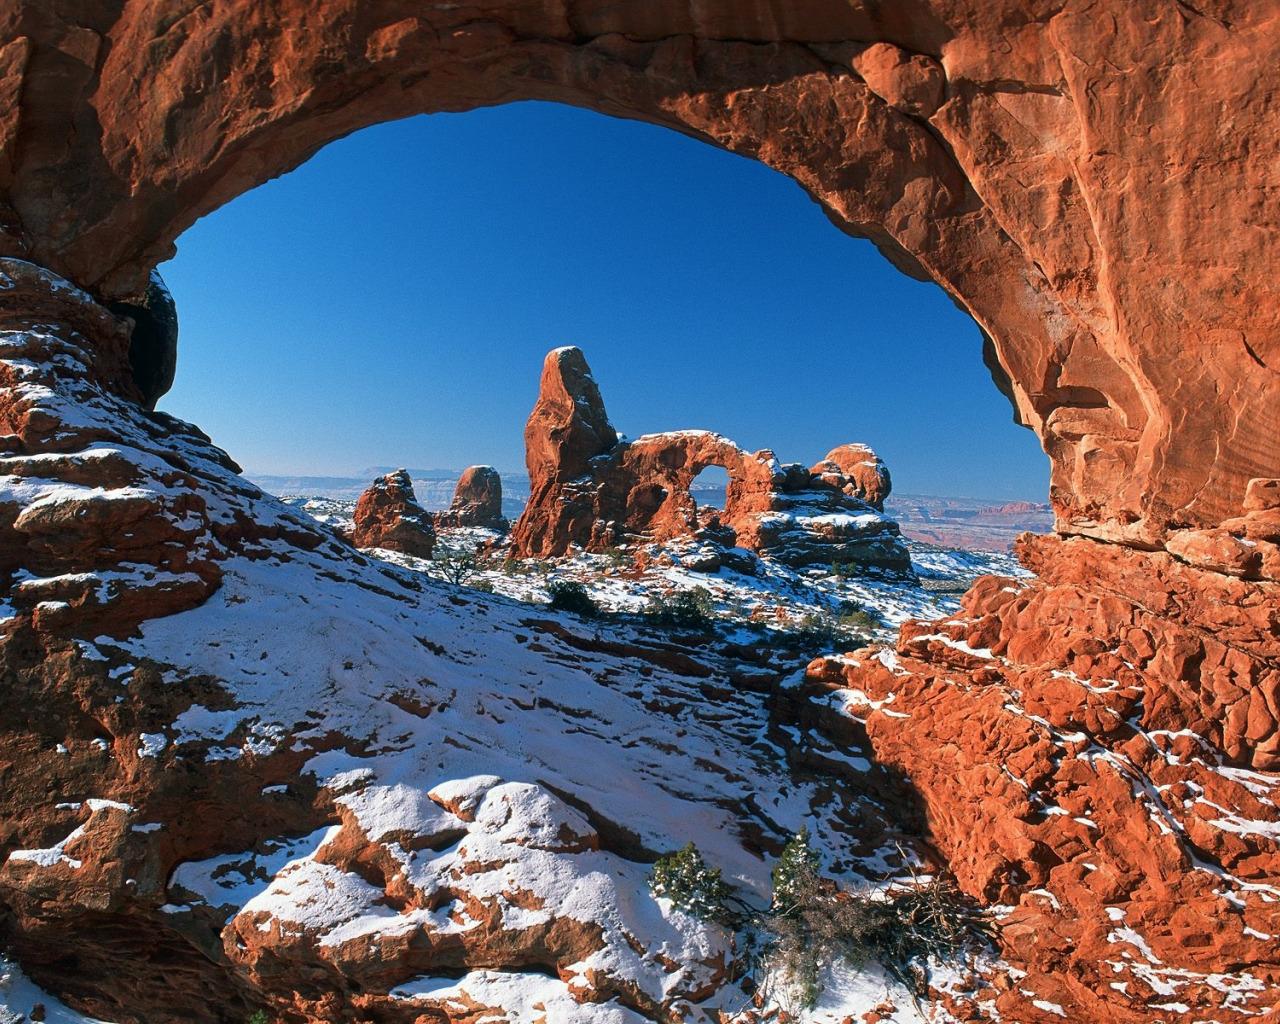 Double-O-Arch, арки, национальный, парк, США, штат, Юта  № 620128 бесплатно